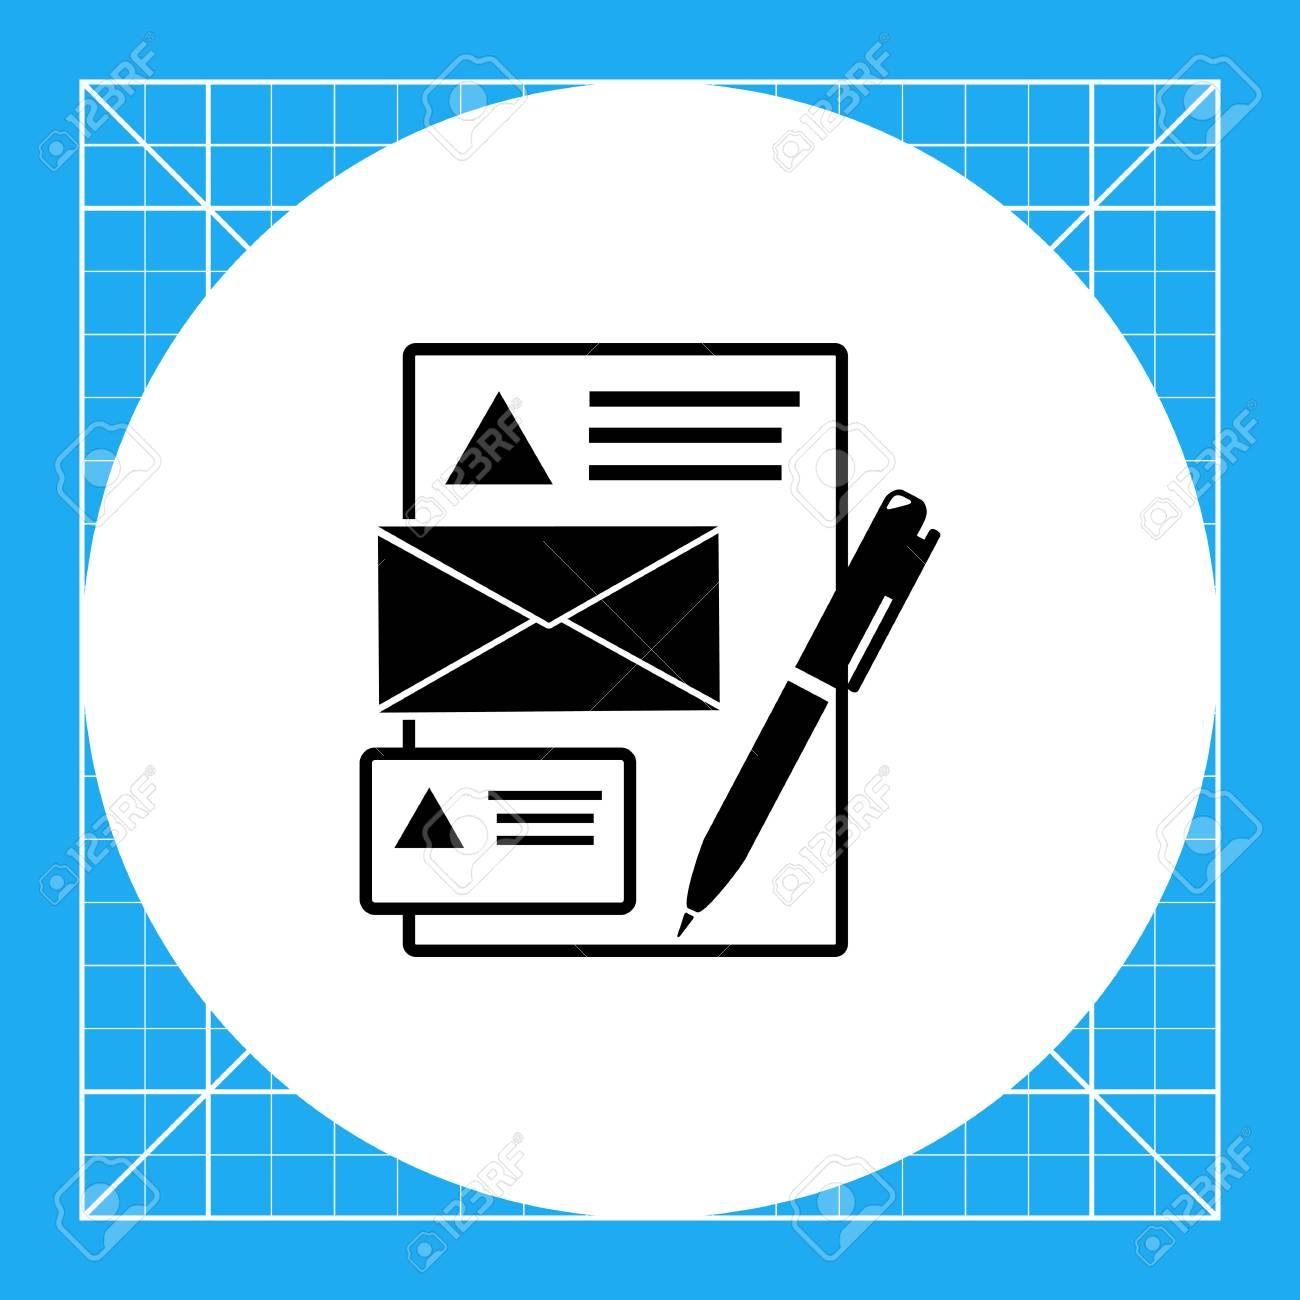 Vector Icone De La Feuille Papier Enveloppe Carte Visite Et